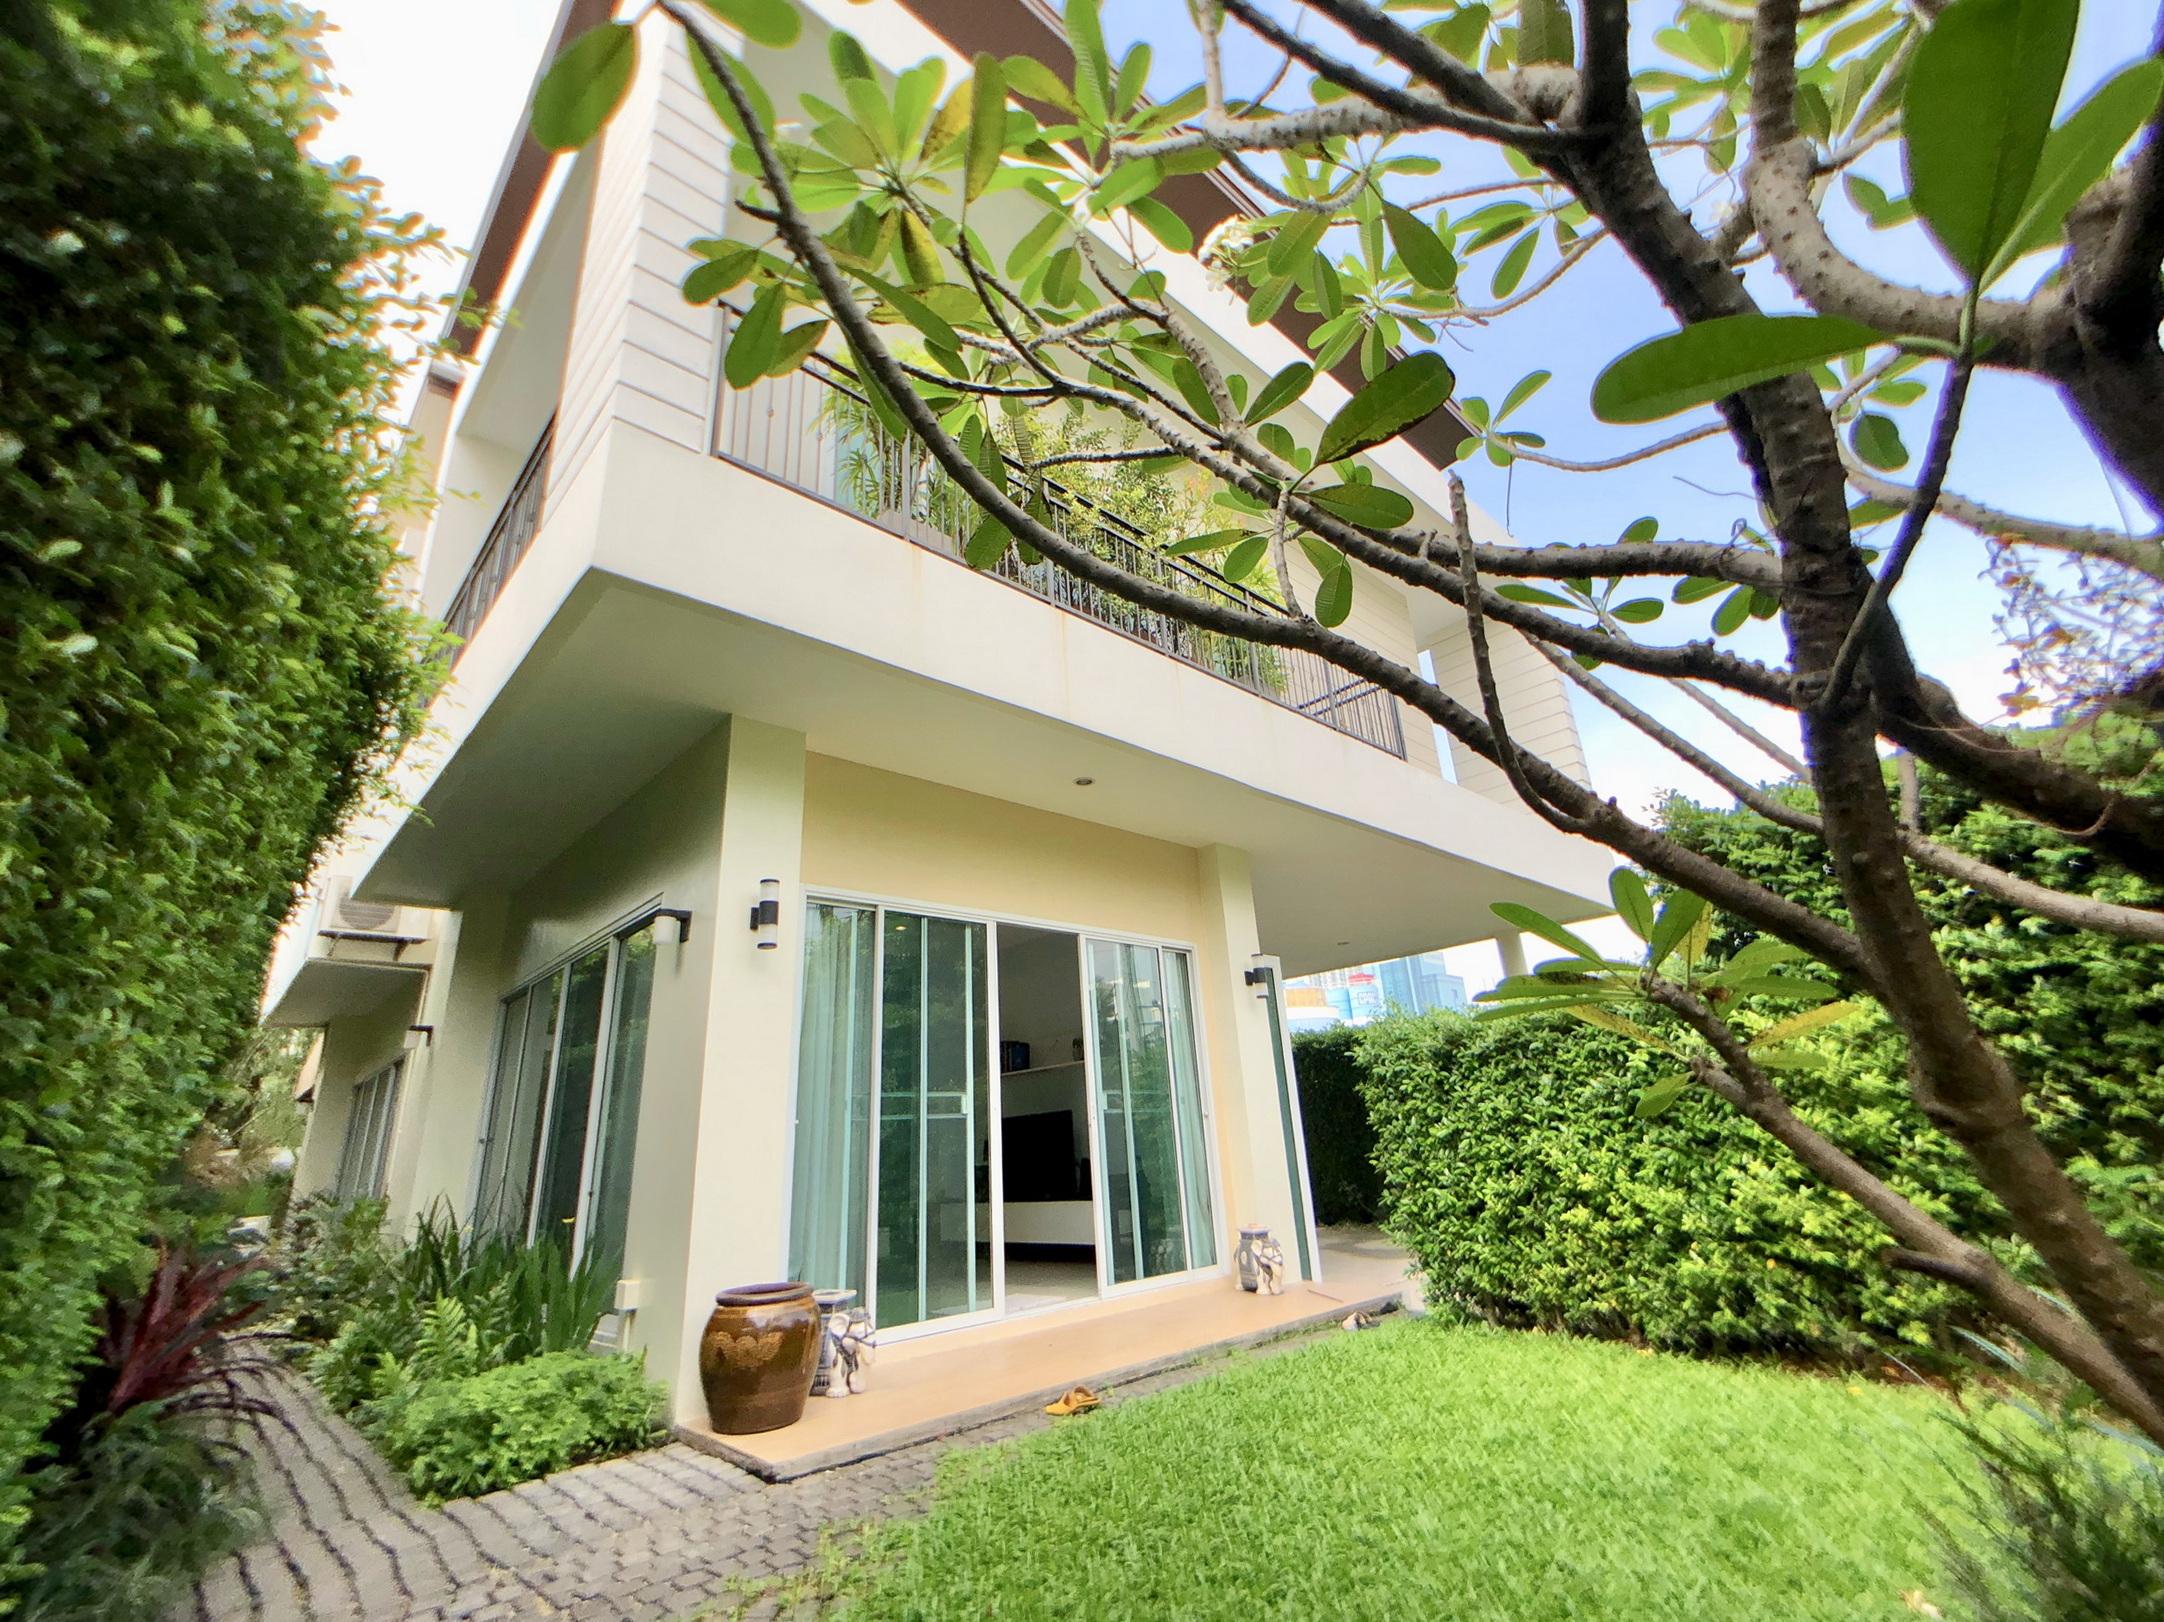 Single House with Small Garden & Pool for rent Ekamai-Rama9 area - 120,000